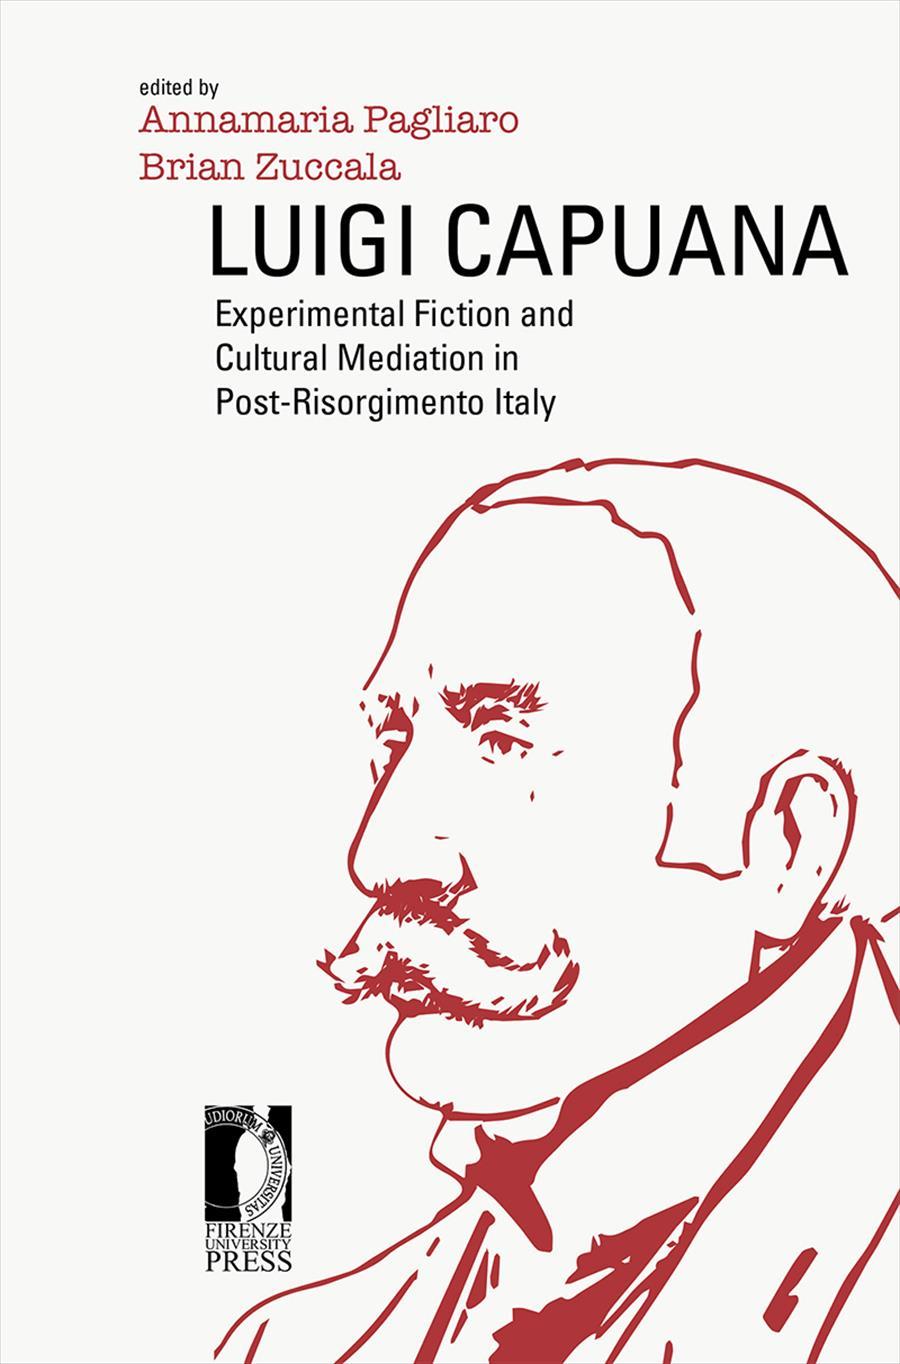 Luigi Capuana: Experimental Fiction and Cultural Mediation in Post-Risorgimento Italy